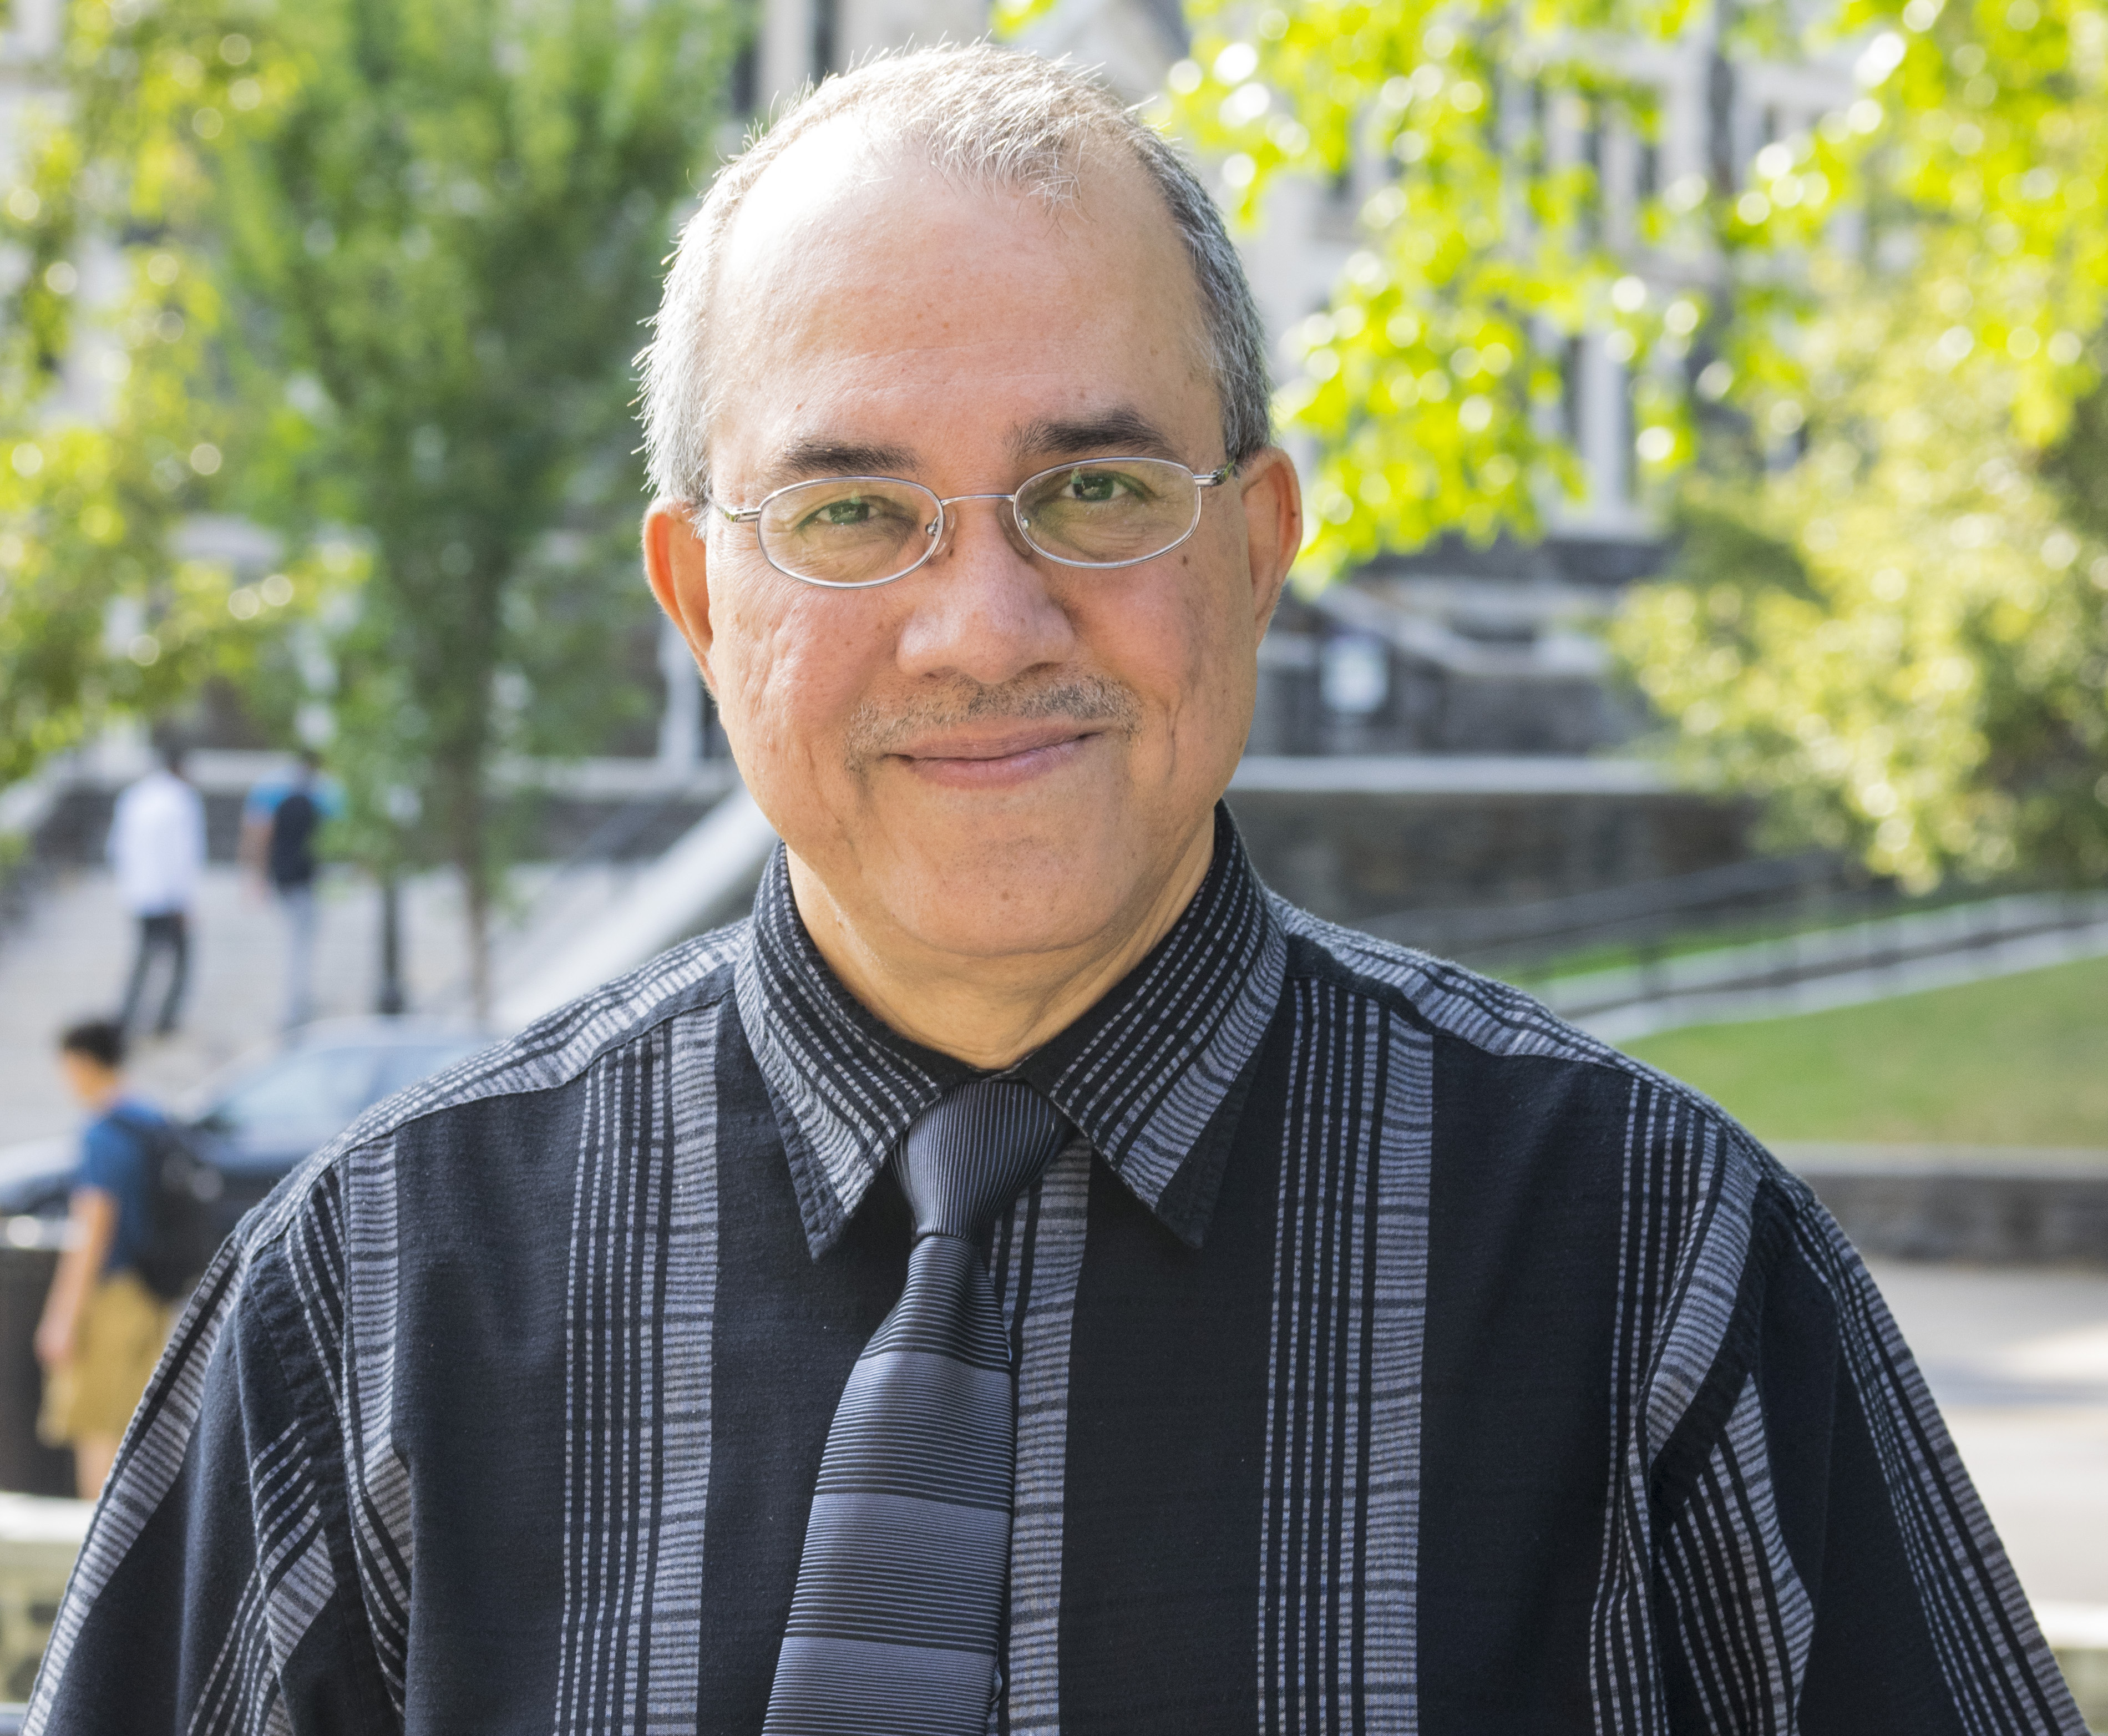 Photograph of Professor Lakshman